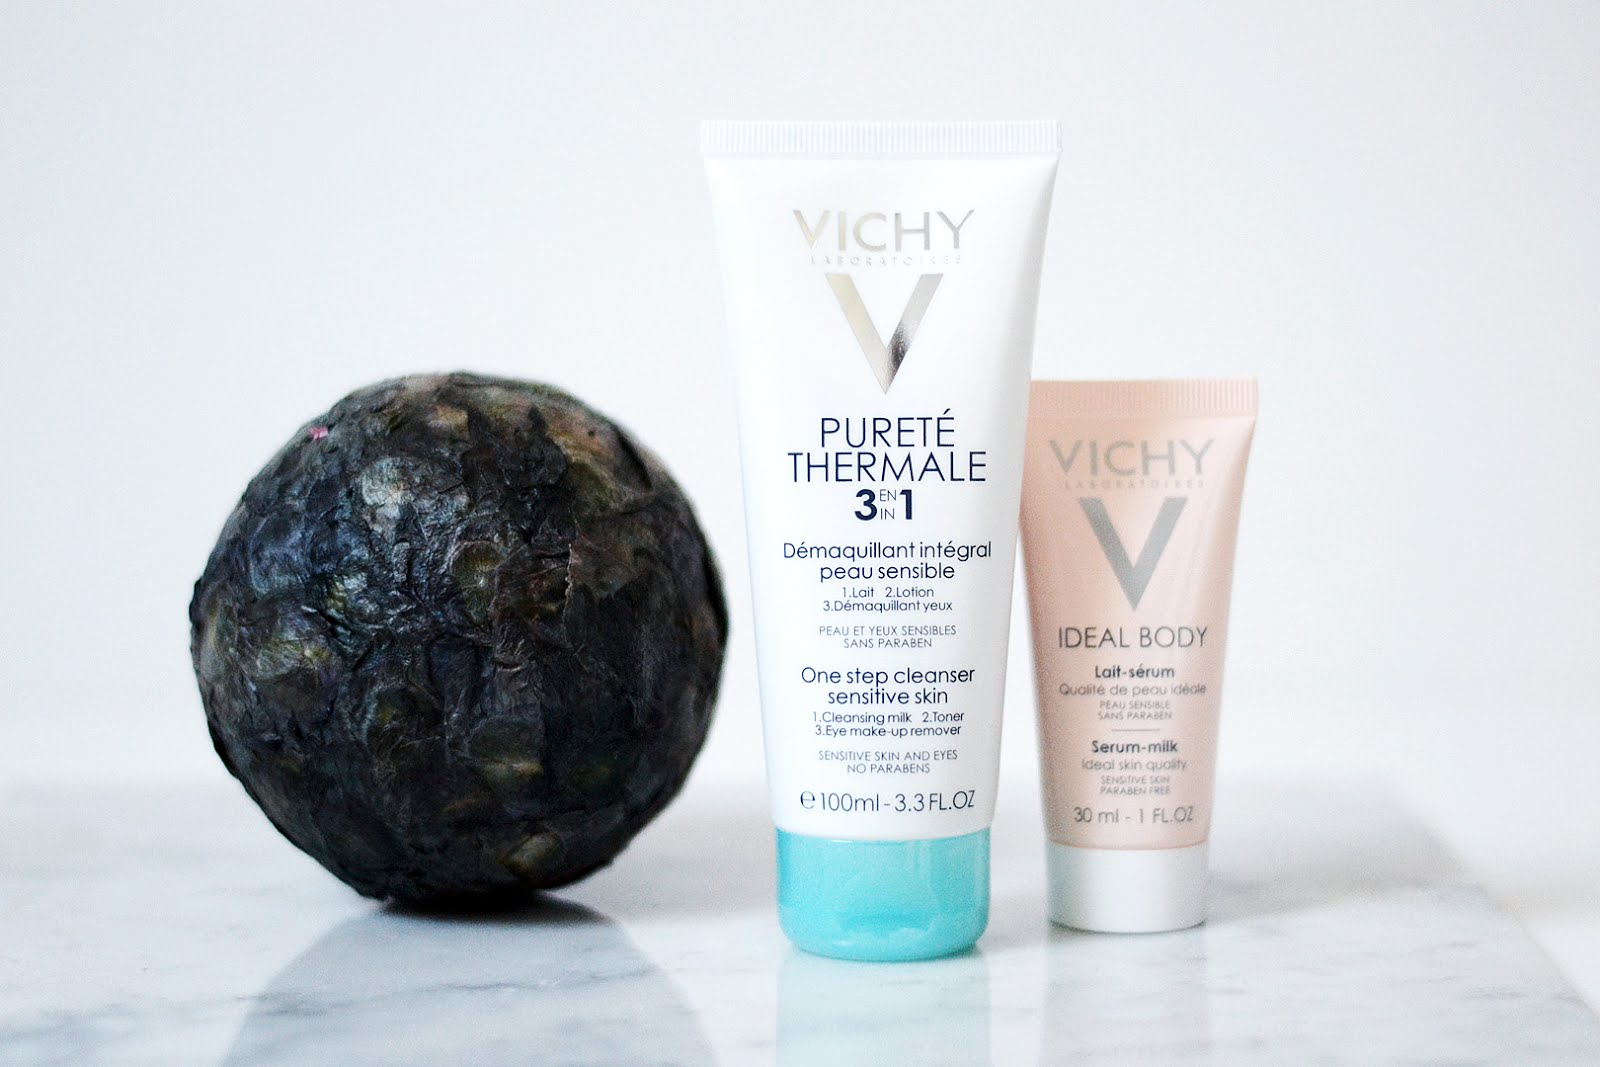 Vichy, purete thermale, ideal body milk serum, viata, online apotheek, review